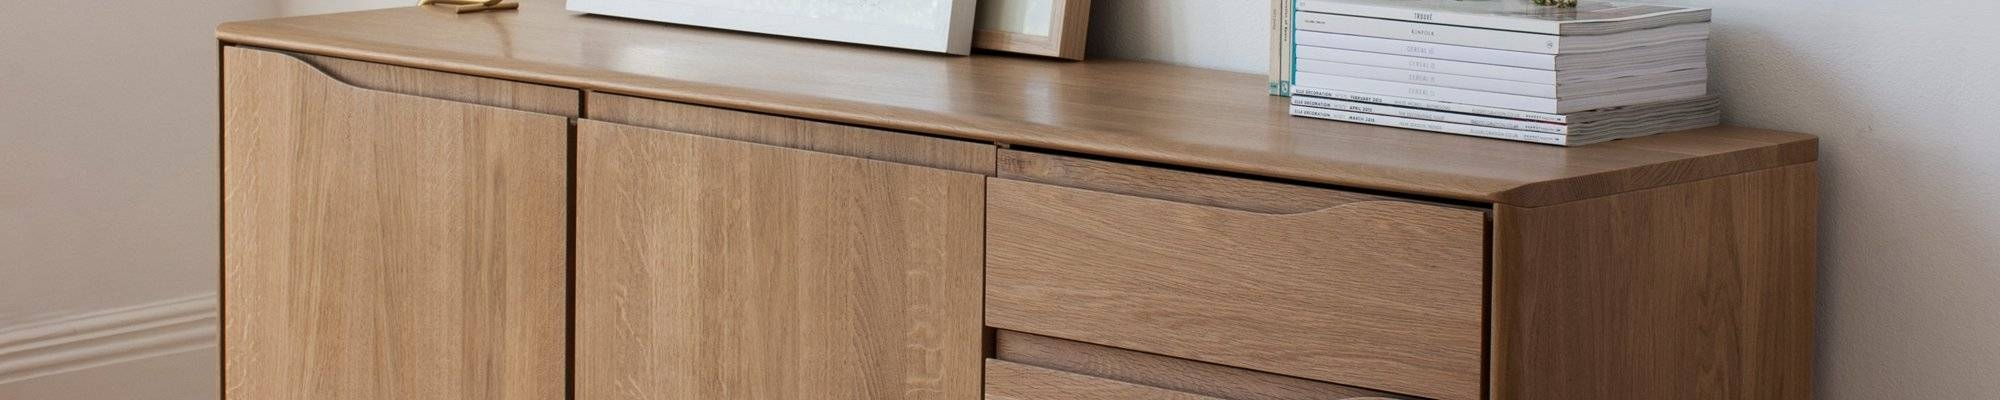 Designer Sideboards | Modern & Contemporary Sideboards | Heal's With Regard To Contemporary Sideboards (#5 of 20)